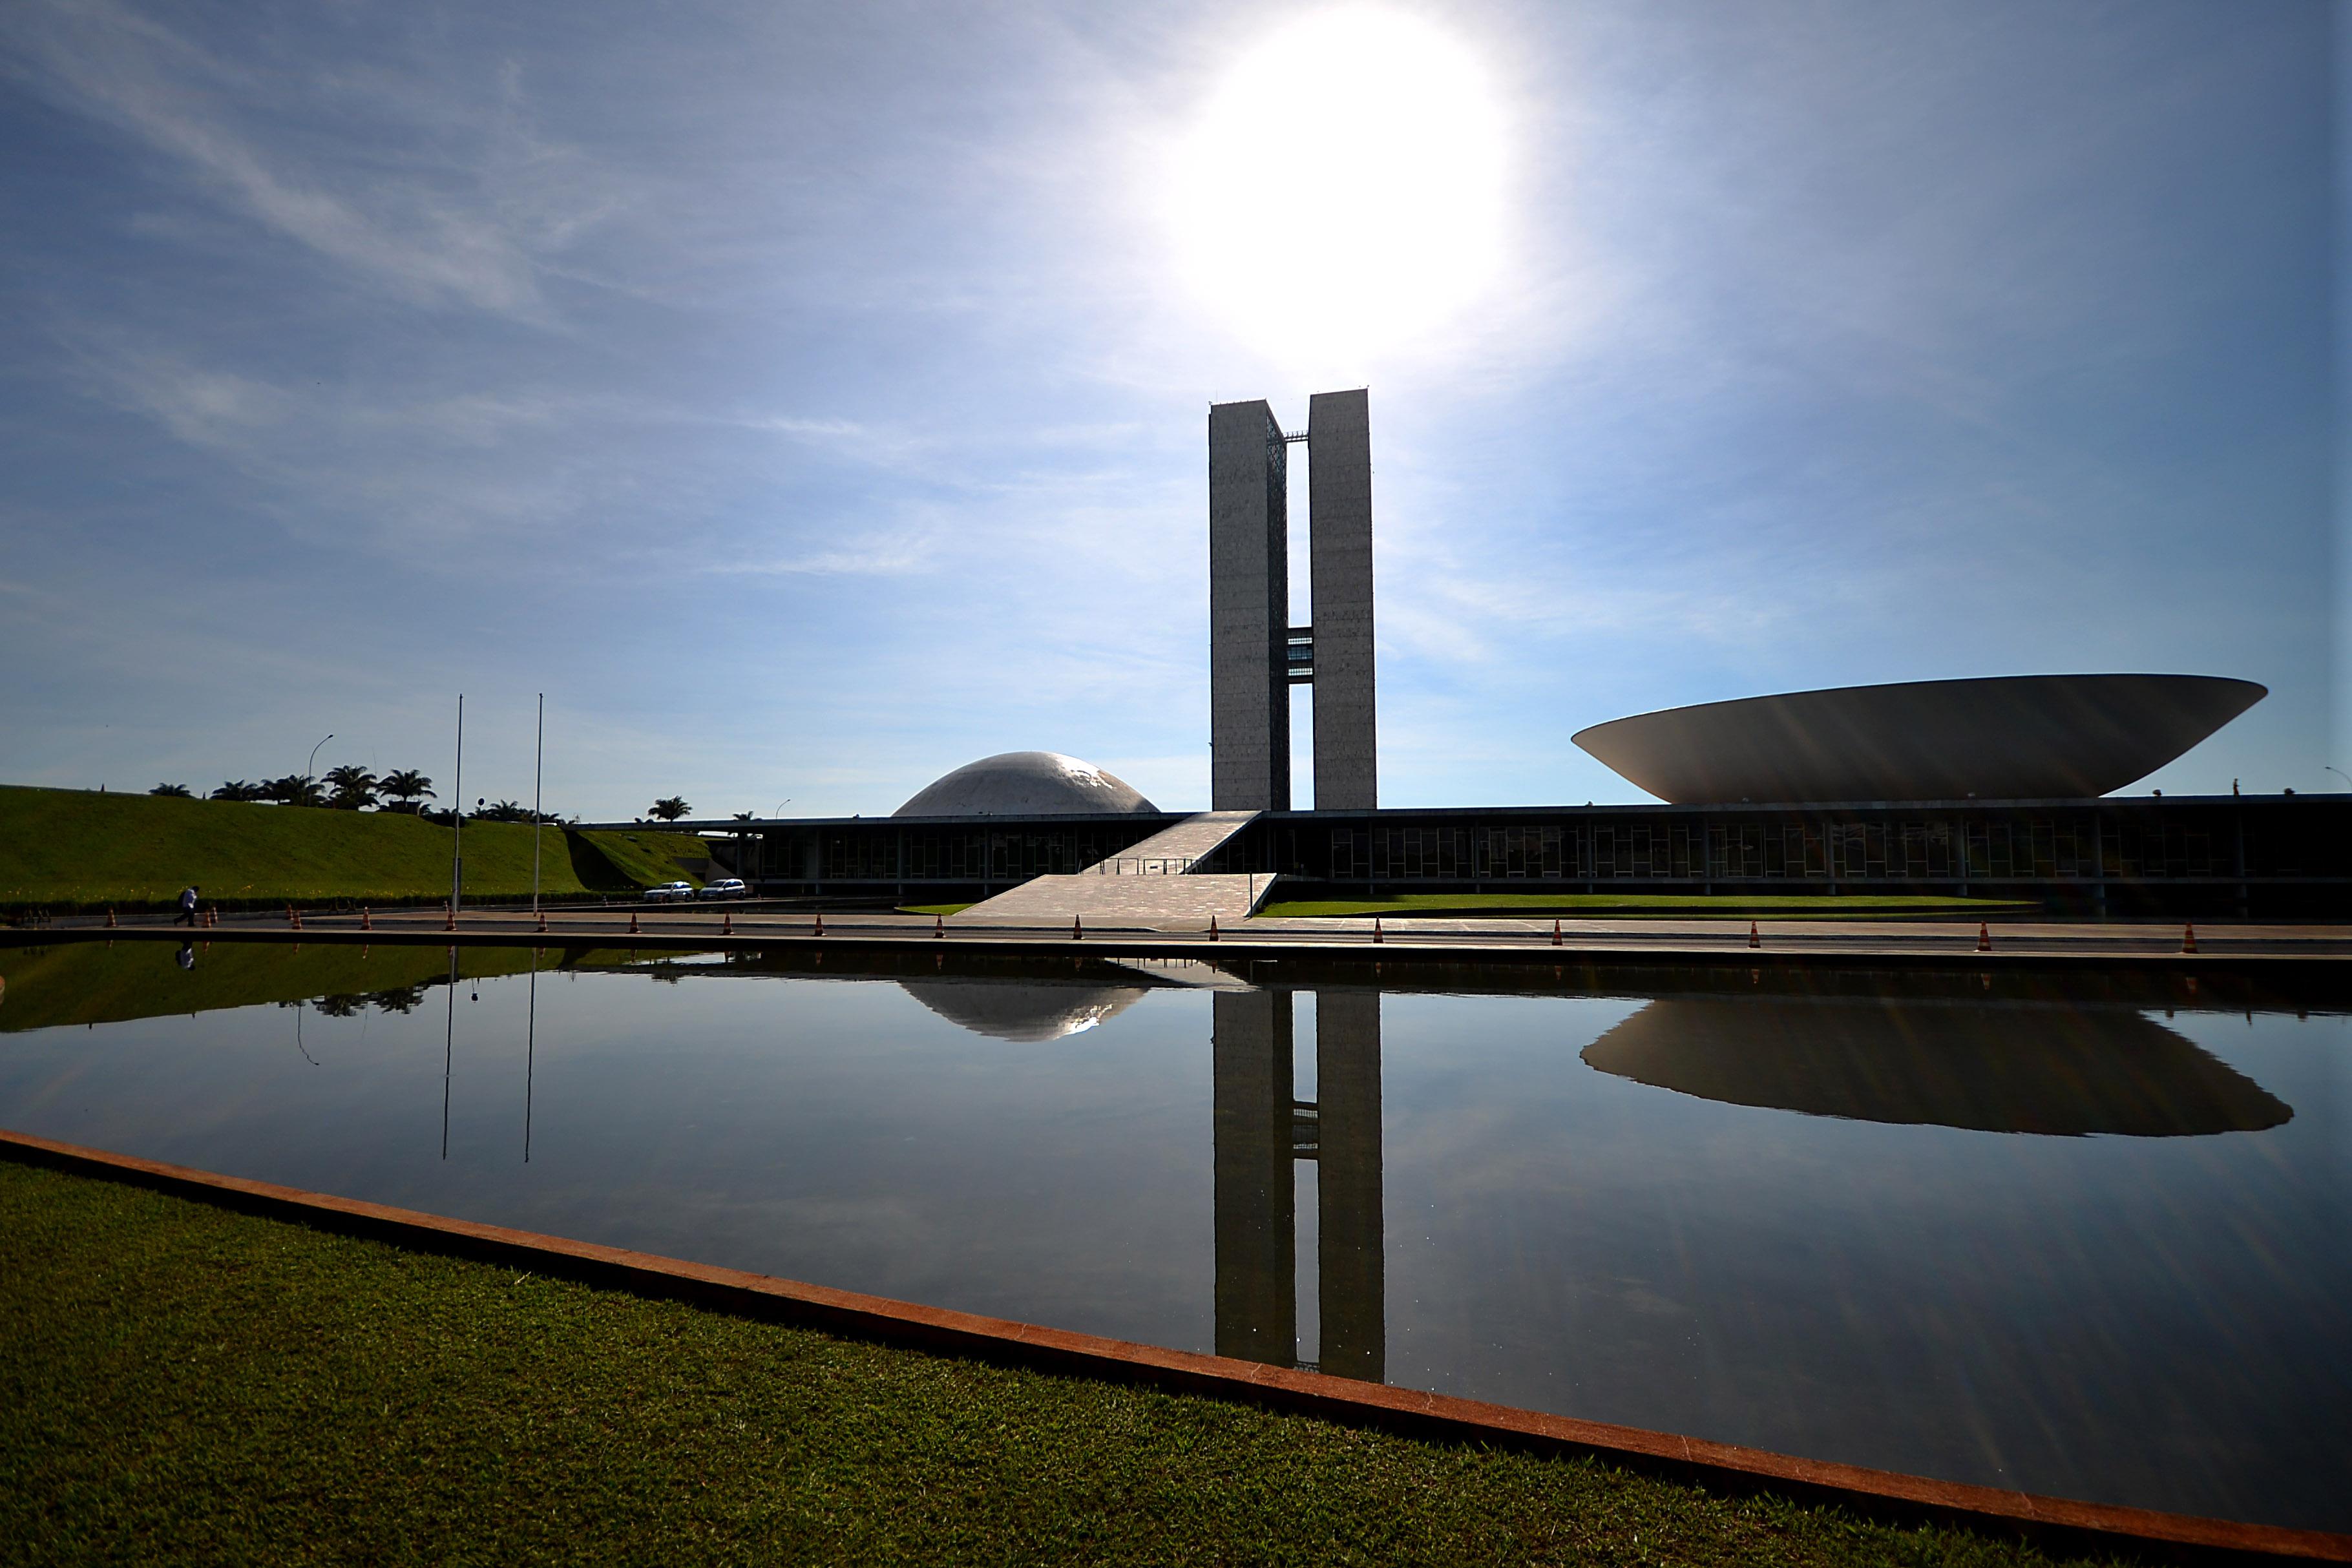 The National Congress building in Brasilia.